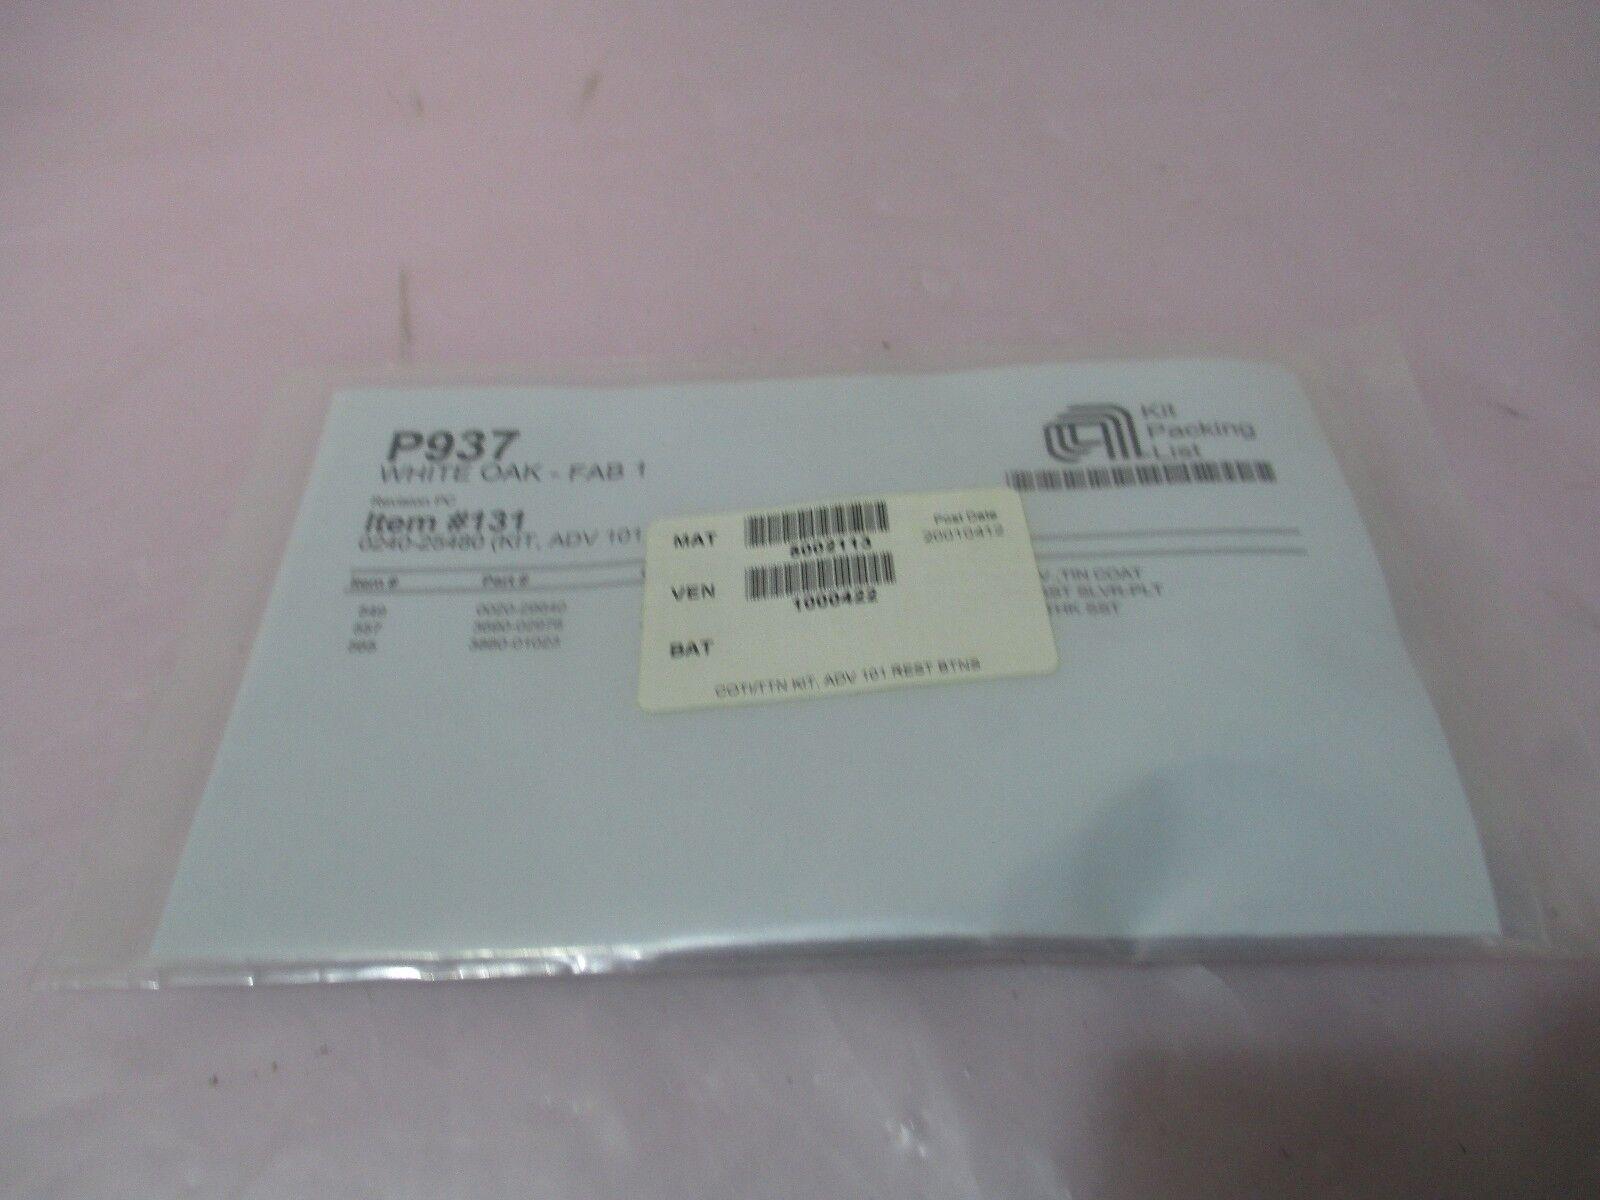 AMAT 0240-25480 Kit, ADV 101 Rest BTNS-FULL CVRG Ped, 0020-29640, 420999